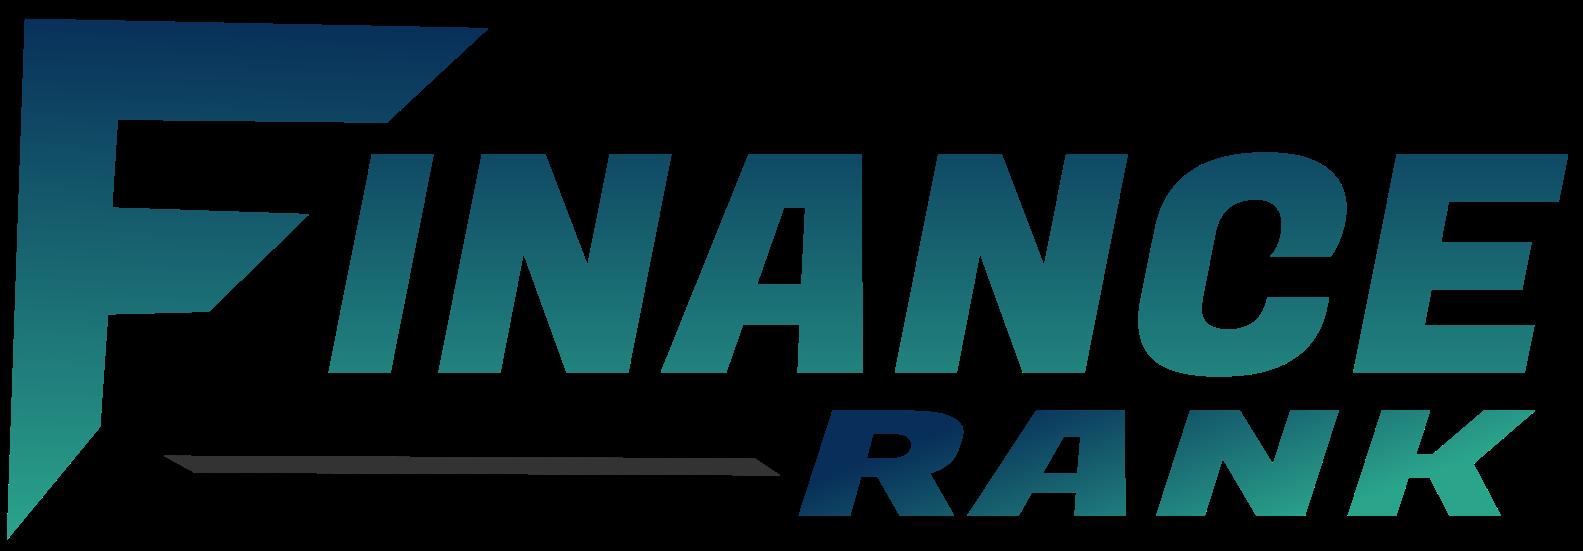 Finance Rank ATM & Bank Tips